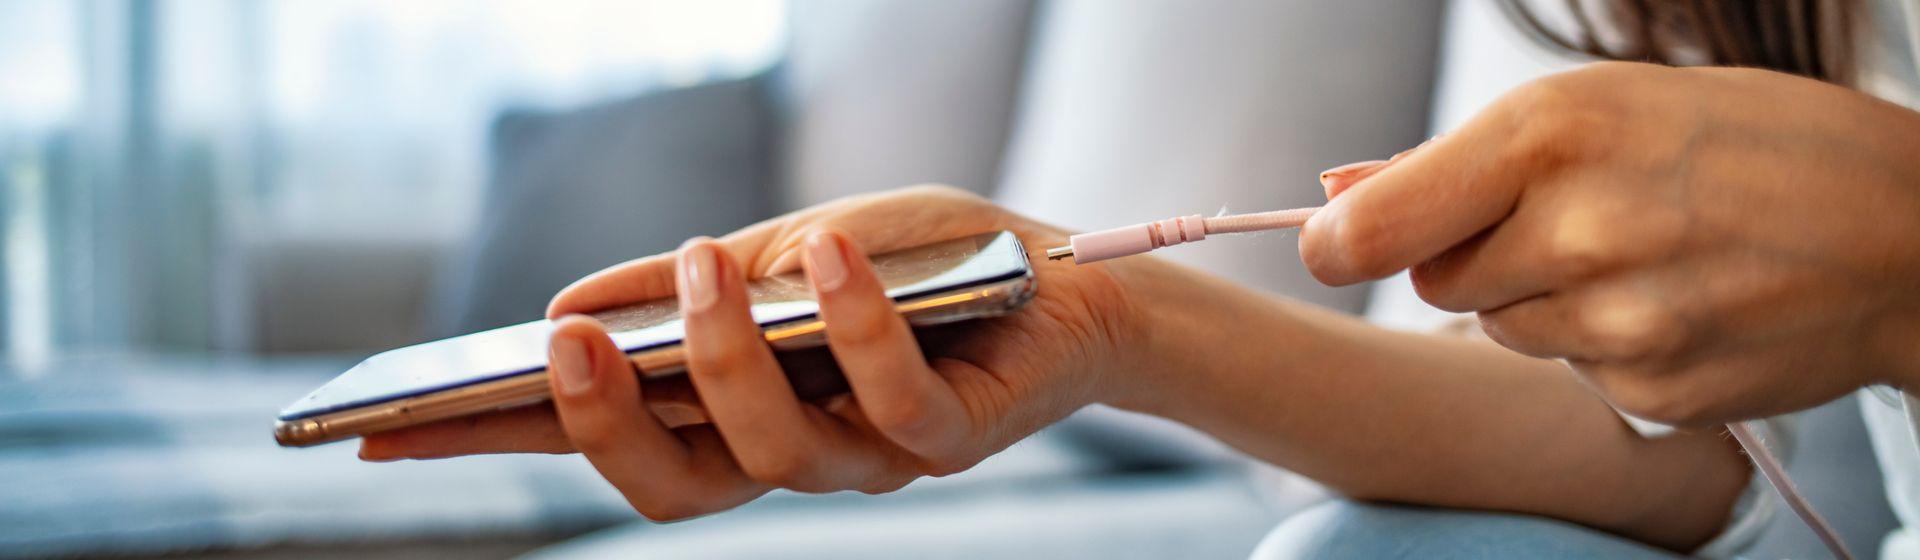 Como funciona o carregamento rápido do celular?